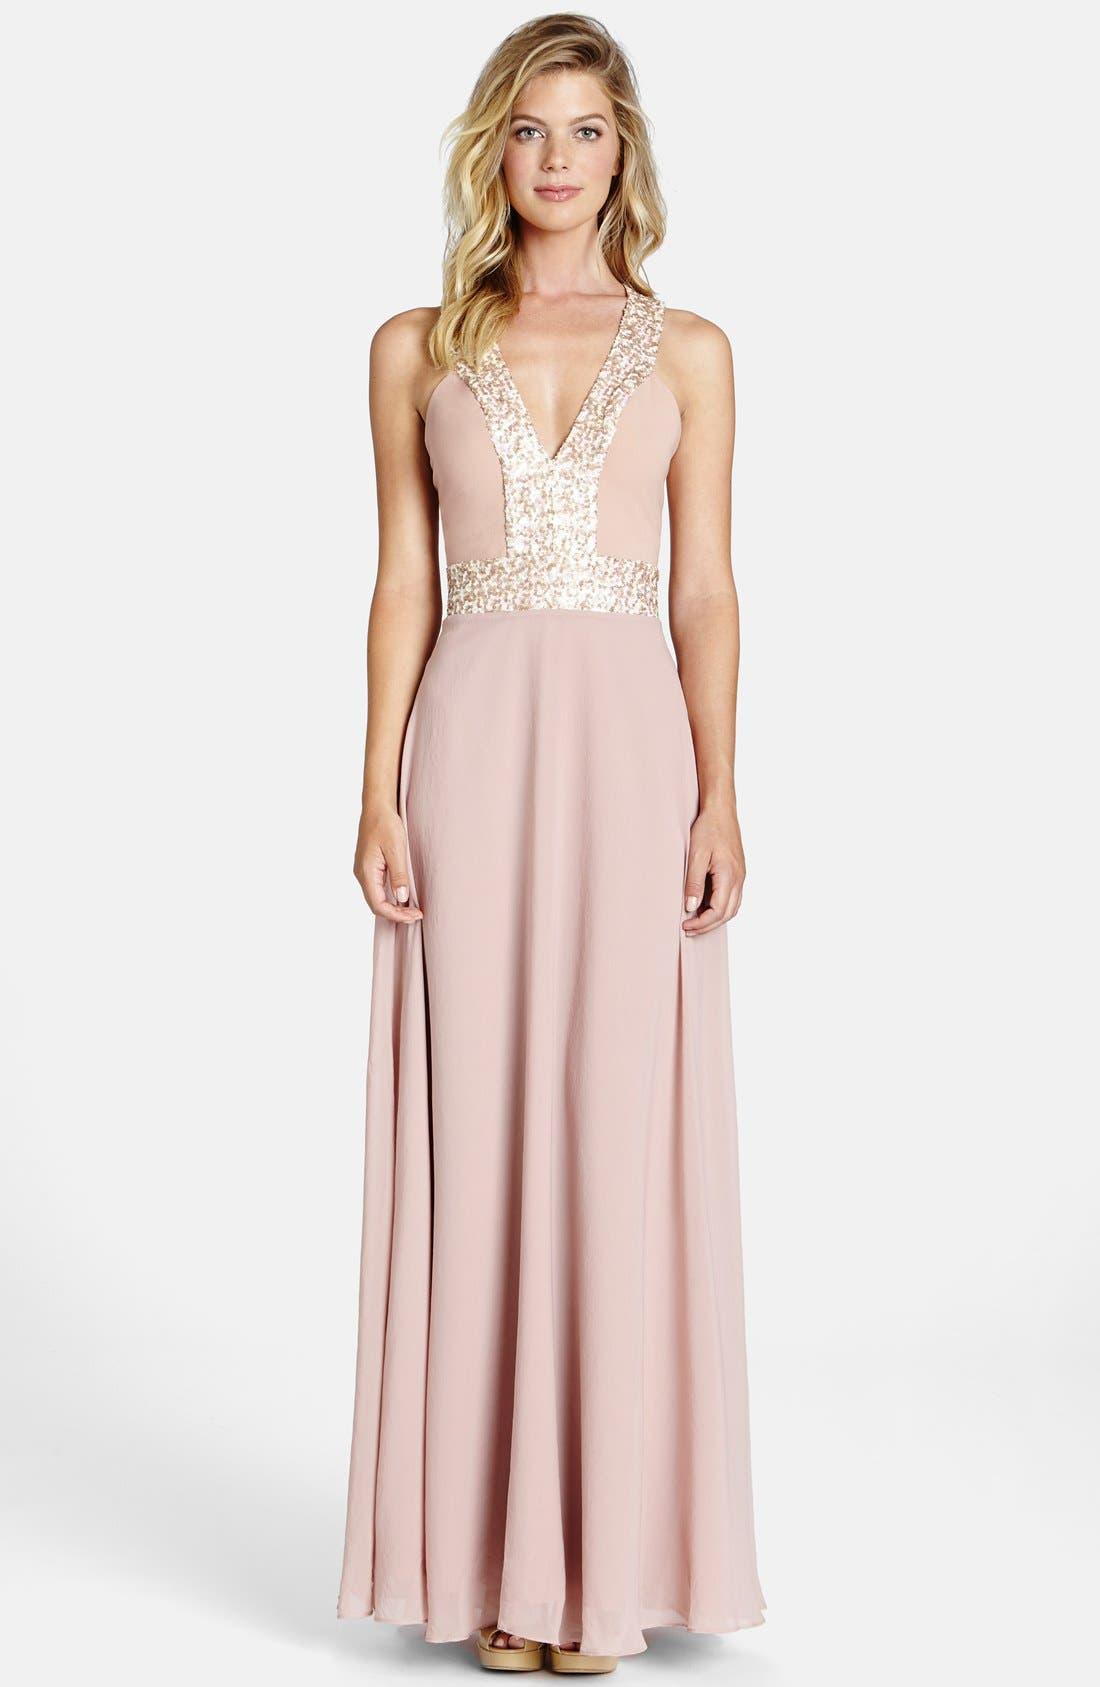 Delani Crepe Gown,                         Main,                         color, Rose Pink/ Opal